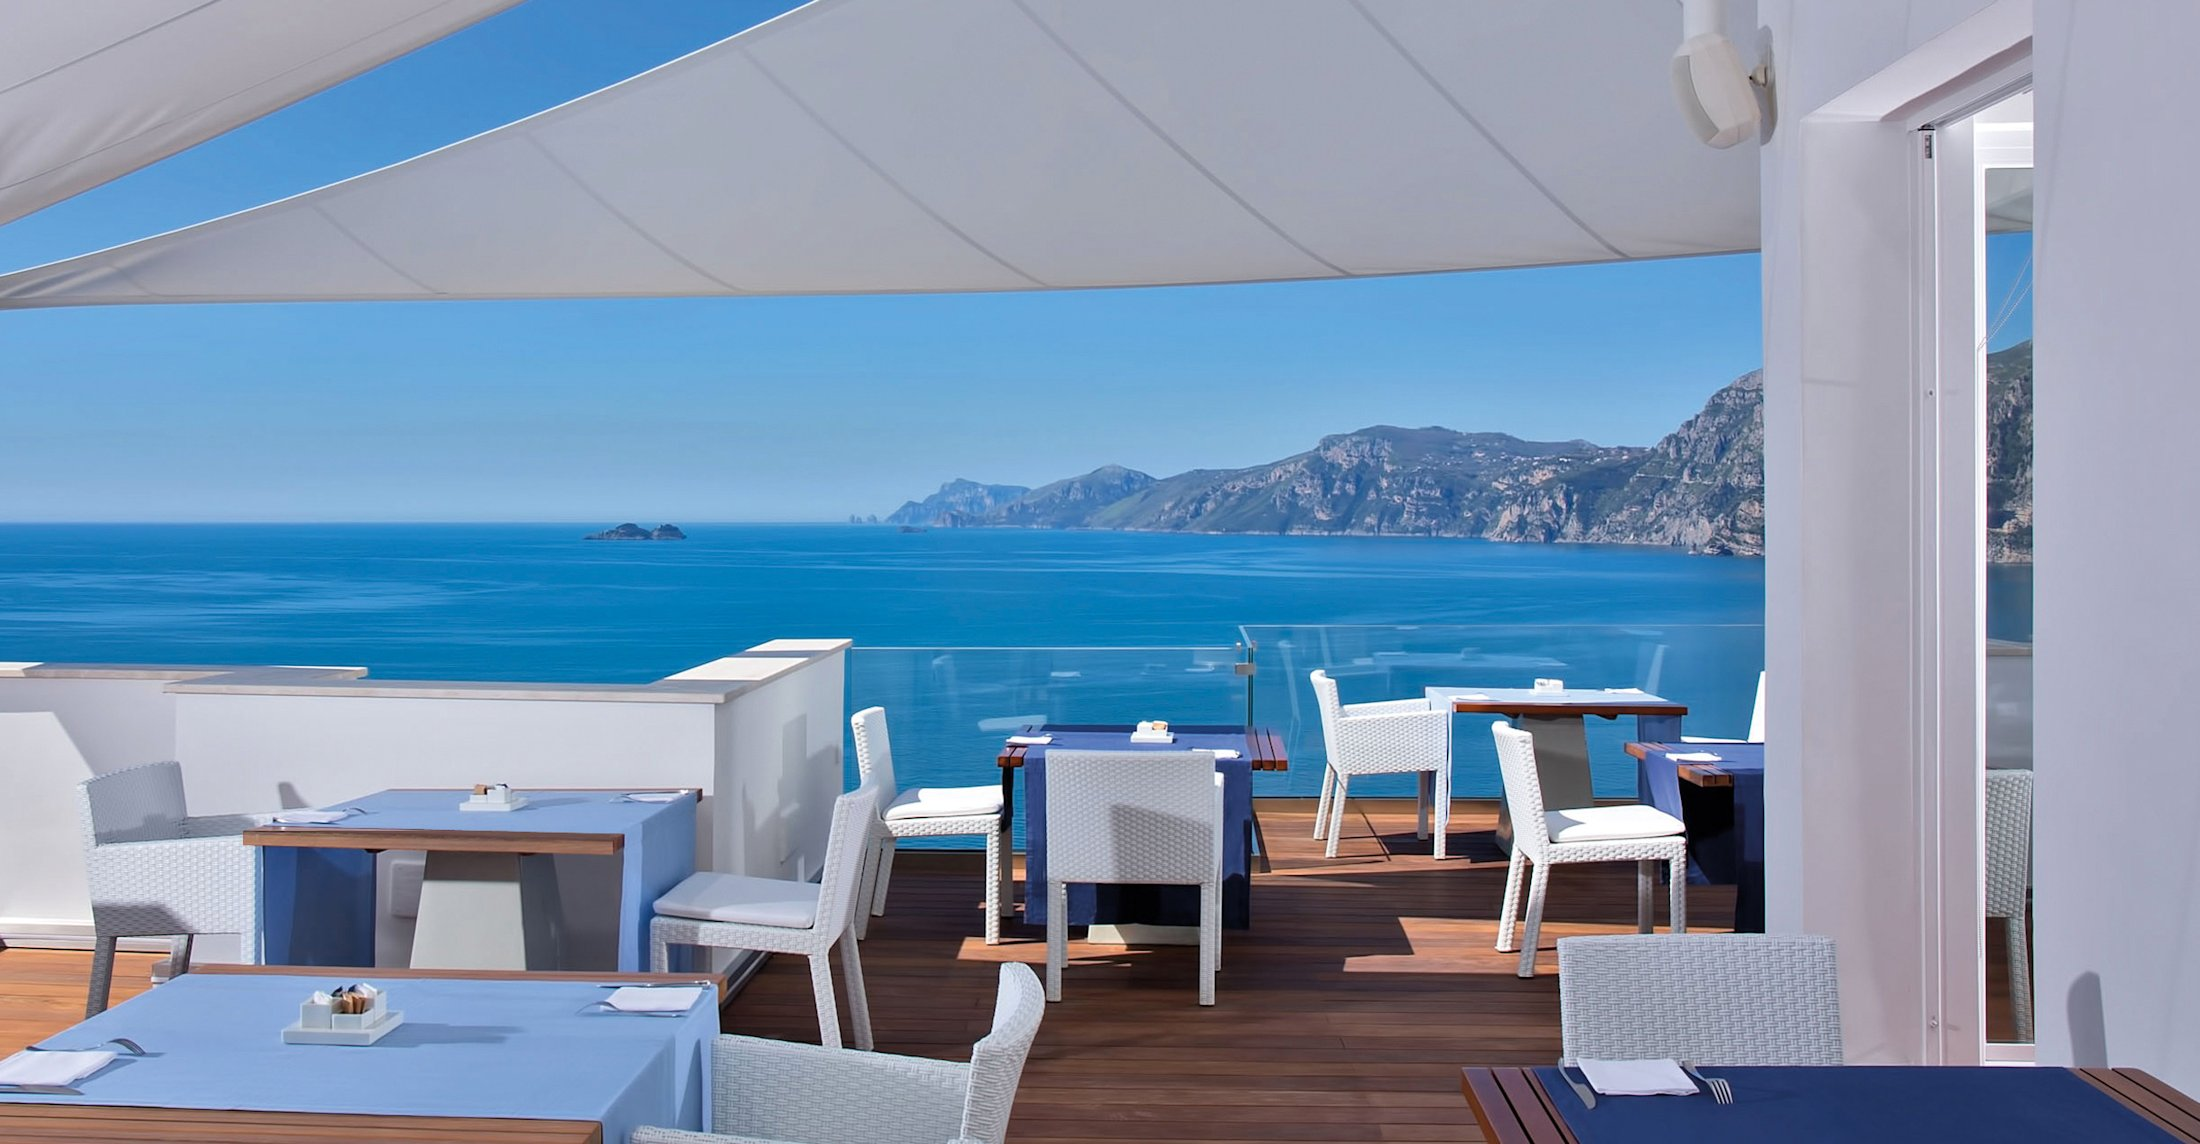 Lifestyle hotel praiano c te amalfitaine casa angelina for Hotel au bord de mer